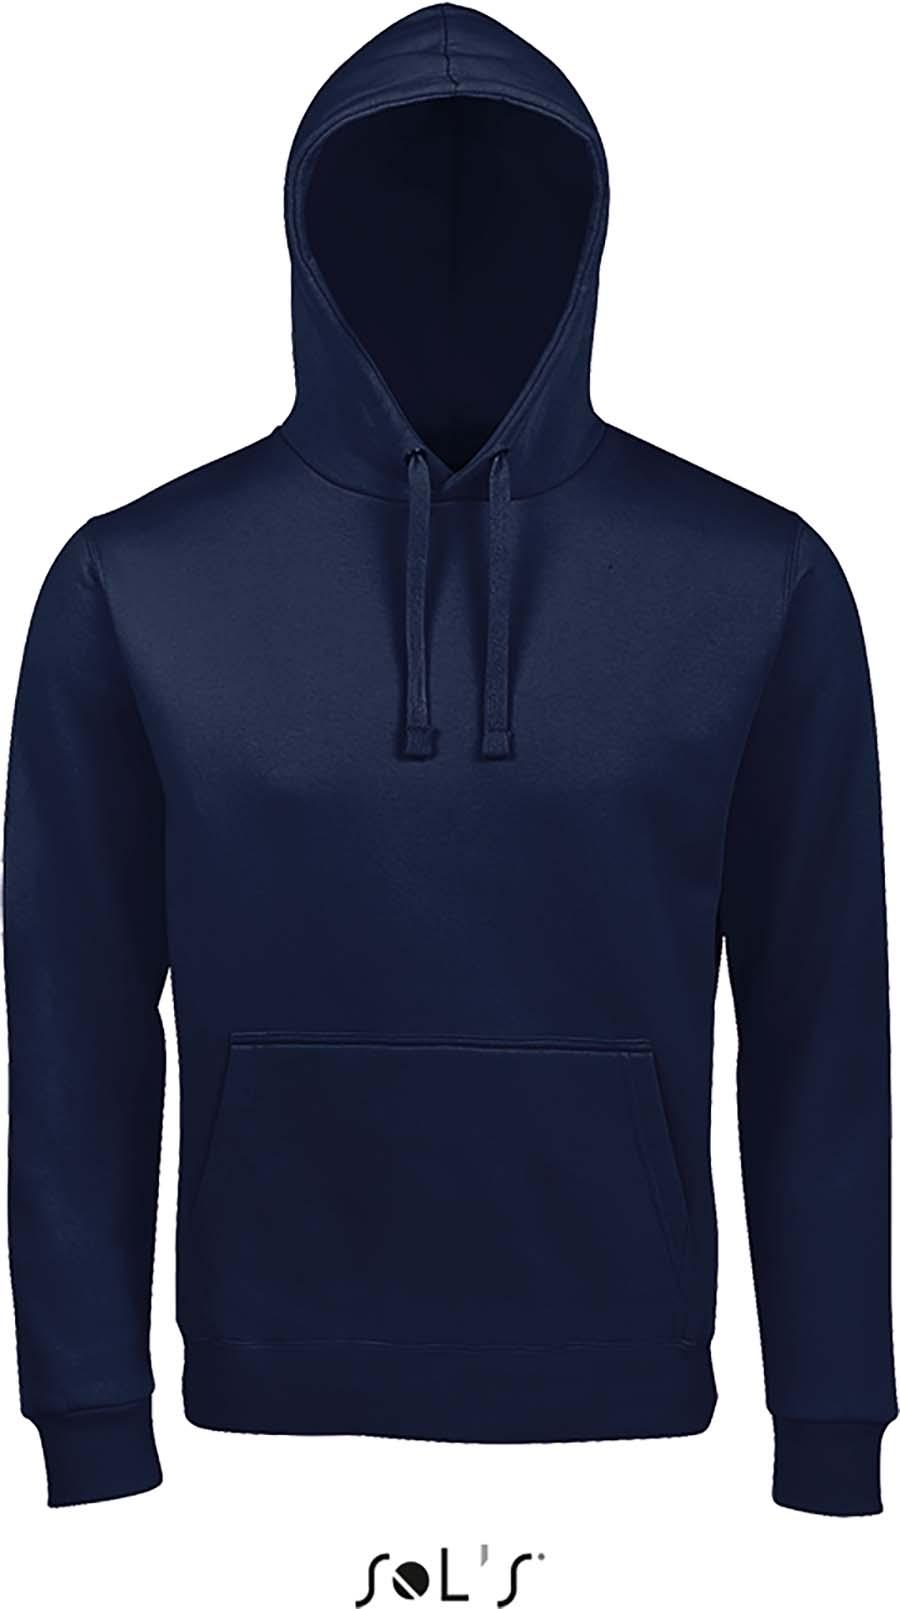 Sweat-shirt unisexe à capuche - 1-1403-7